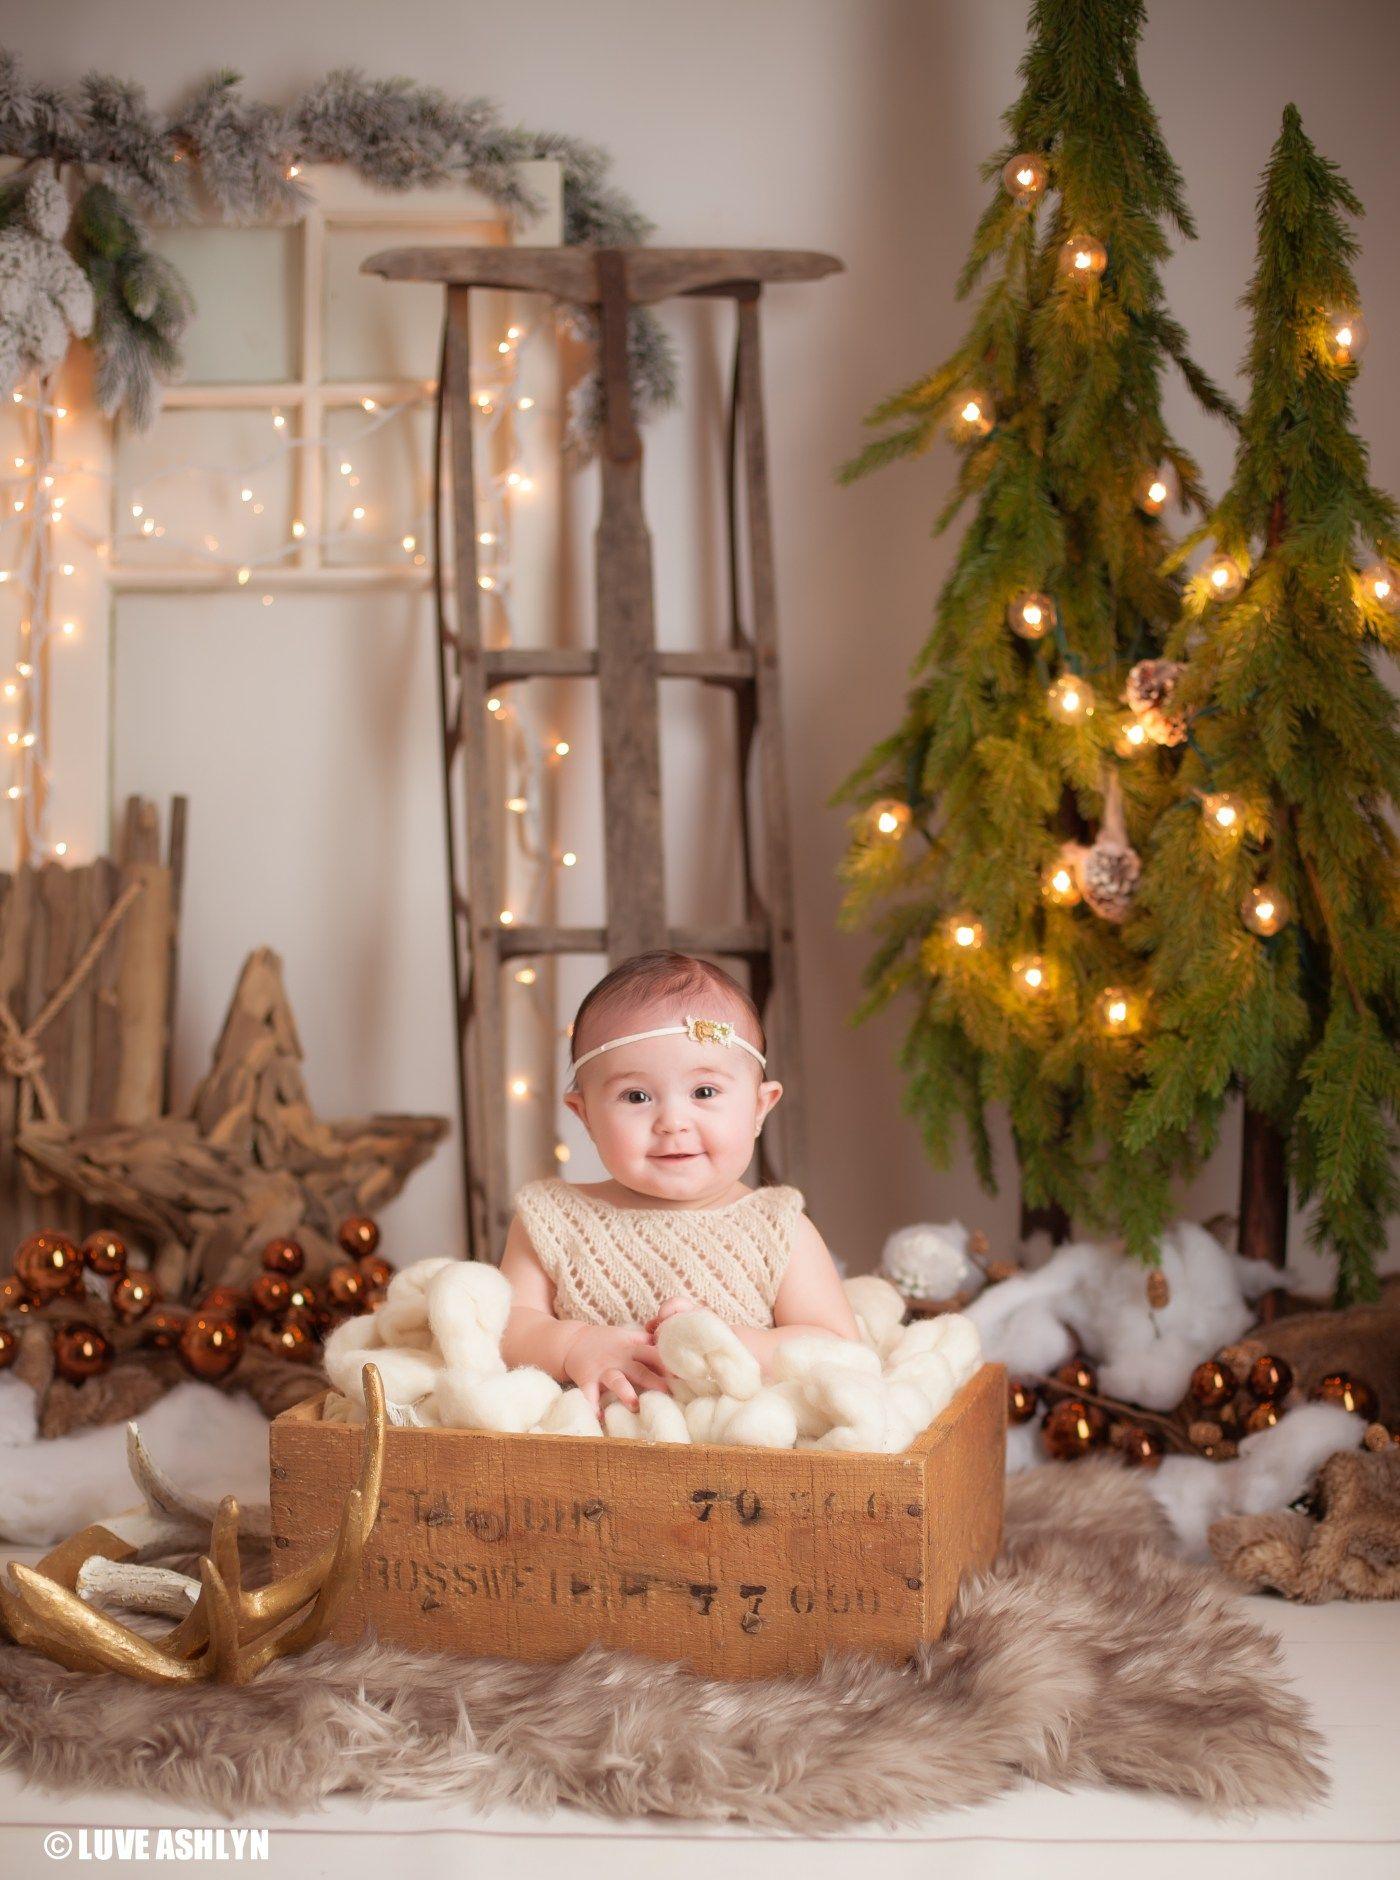 Christmas Picture Backdrop Ideas Studio Christmas Baby Photography Set Up Luveashlynca